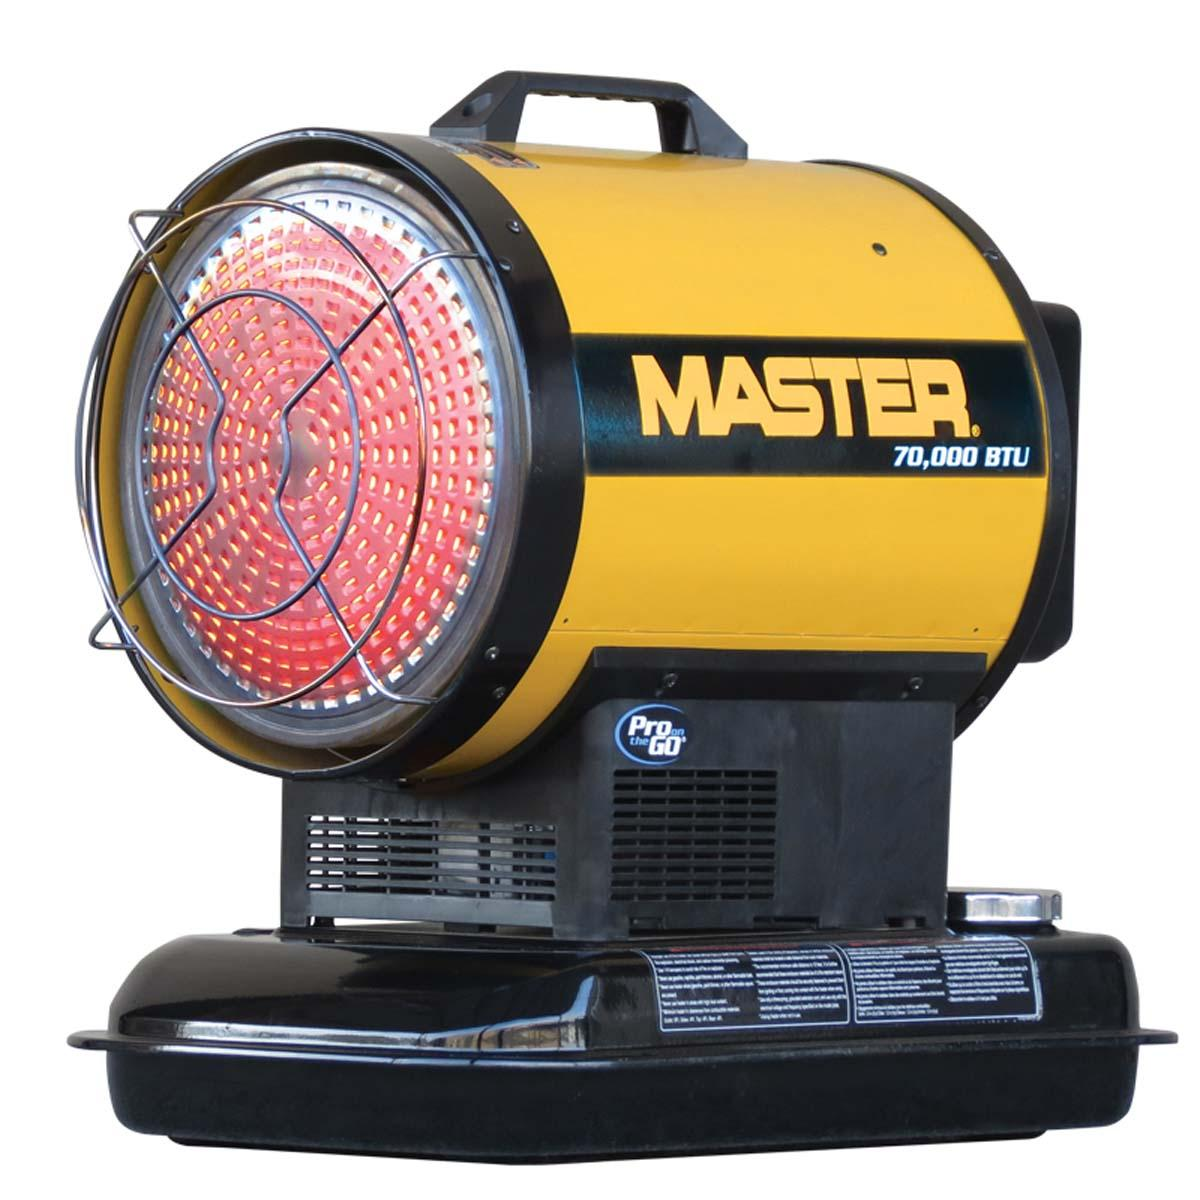 MASTER 70,000 BTU Kerosene/Diesel Radiant Heater